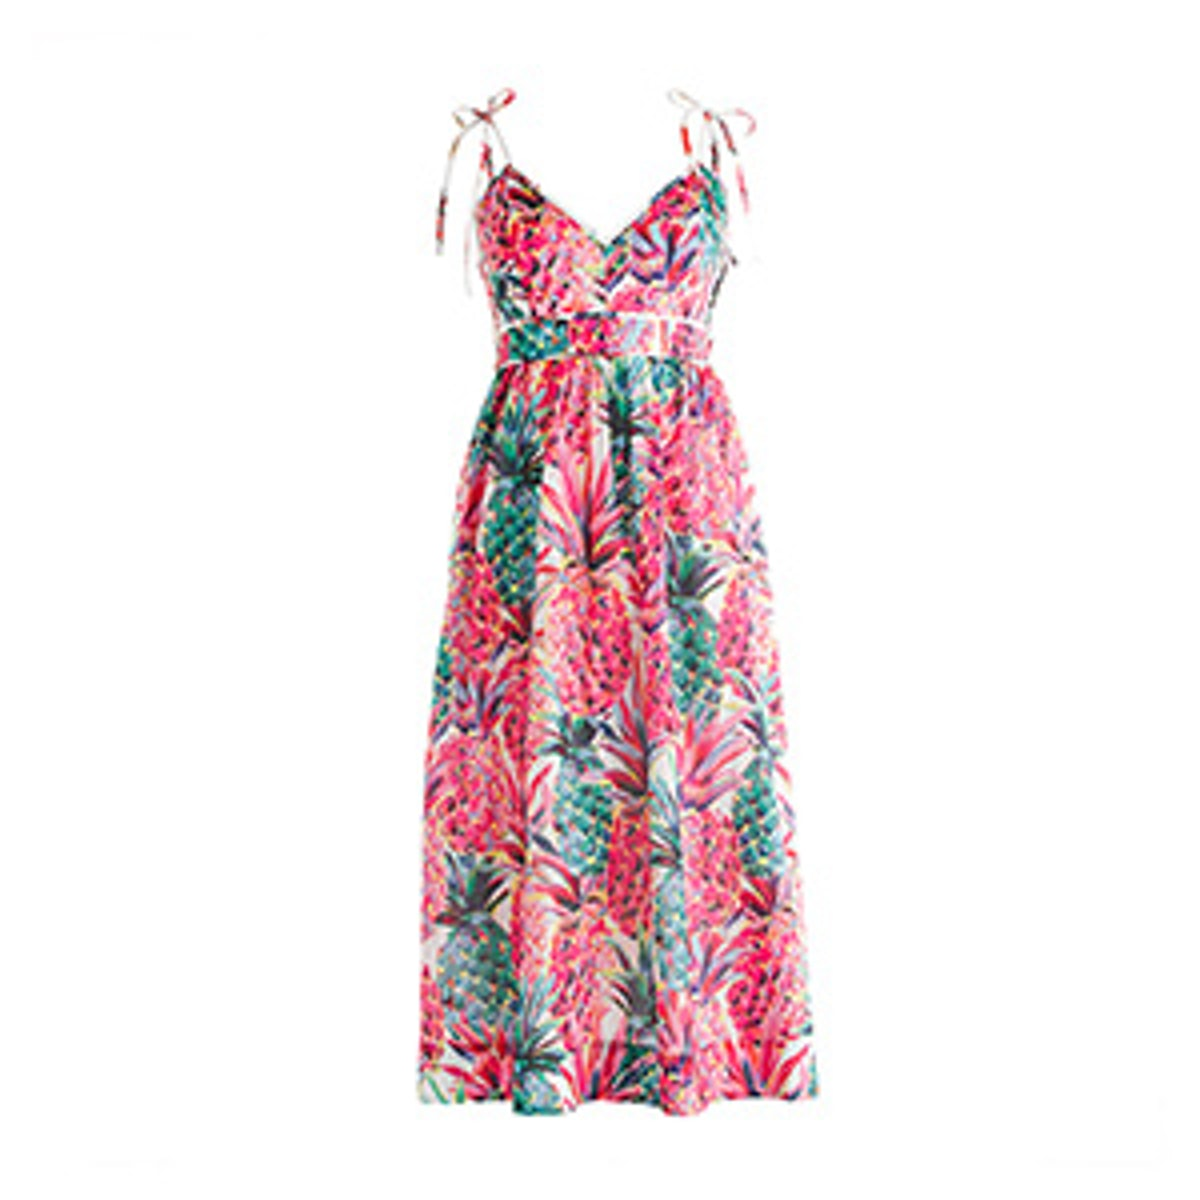 Spaghetti-Strap Dress in Ratti Printed Pineapple